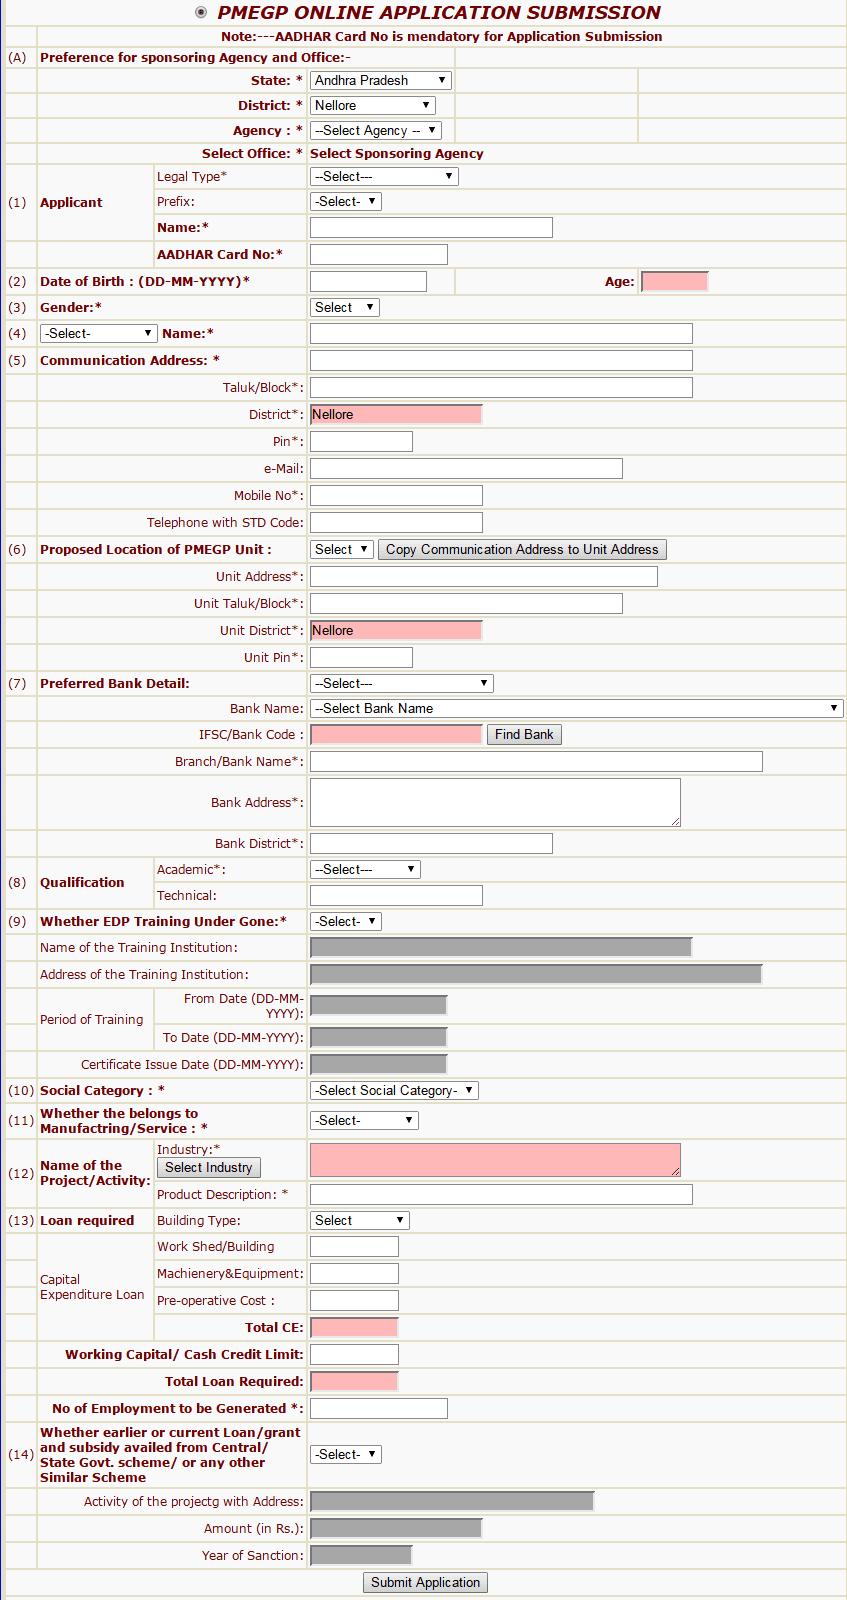 PMEGP Online Application